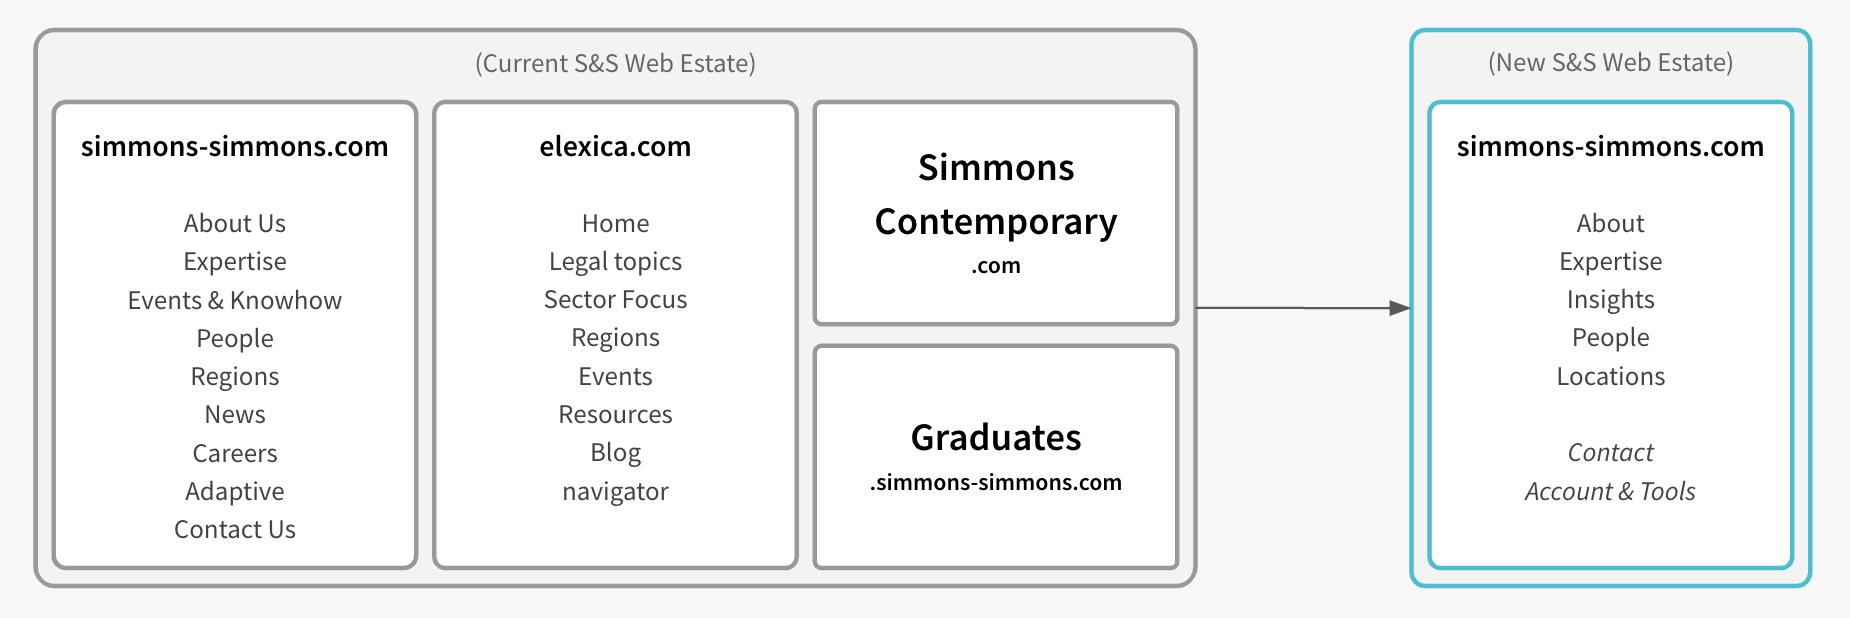 2.Simmons-webEstate